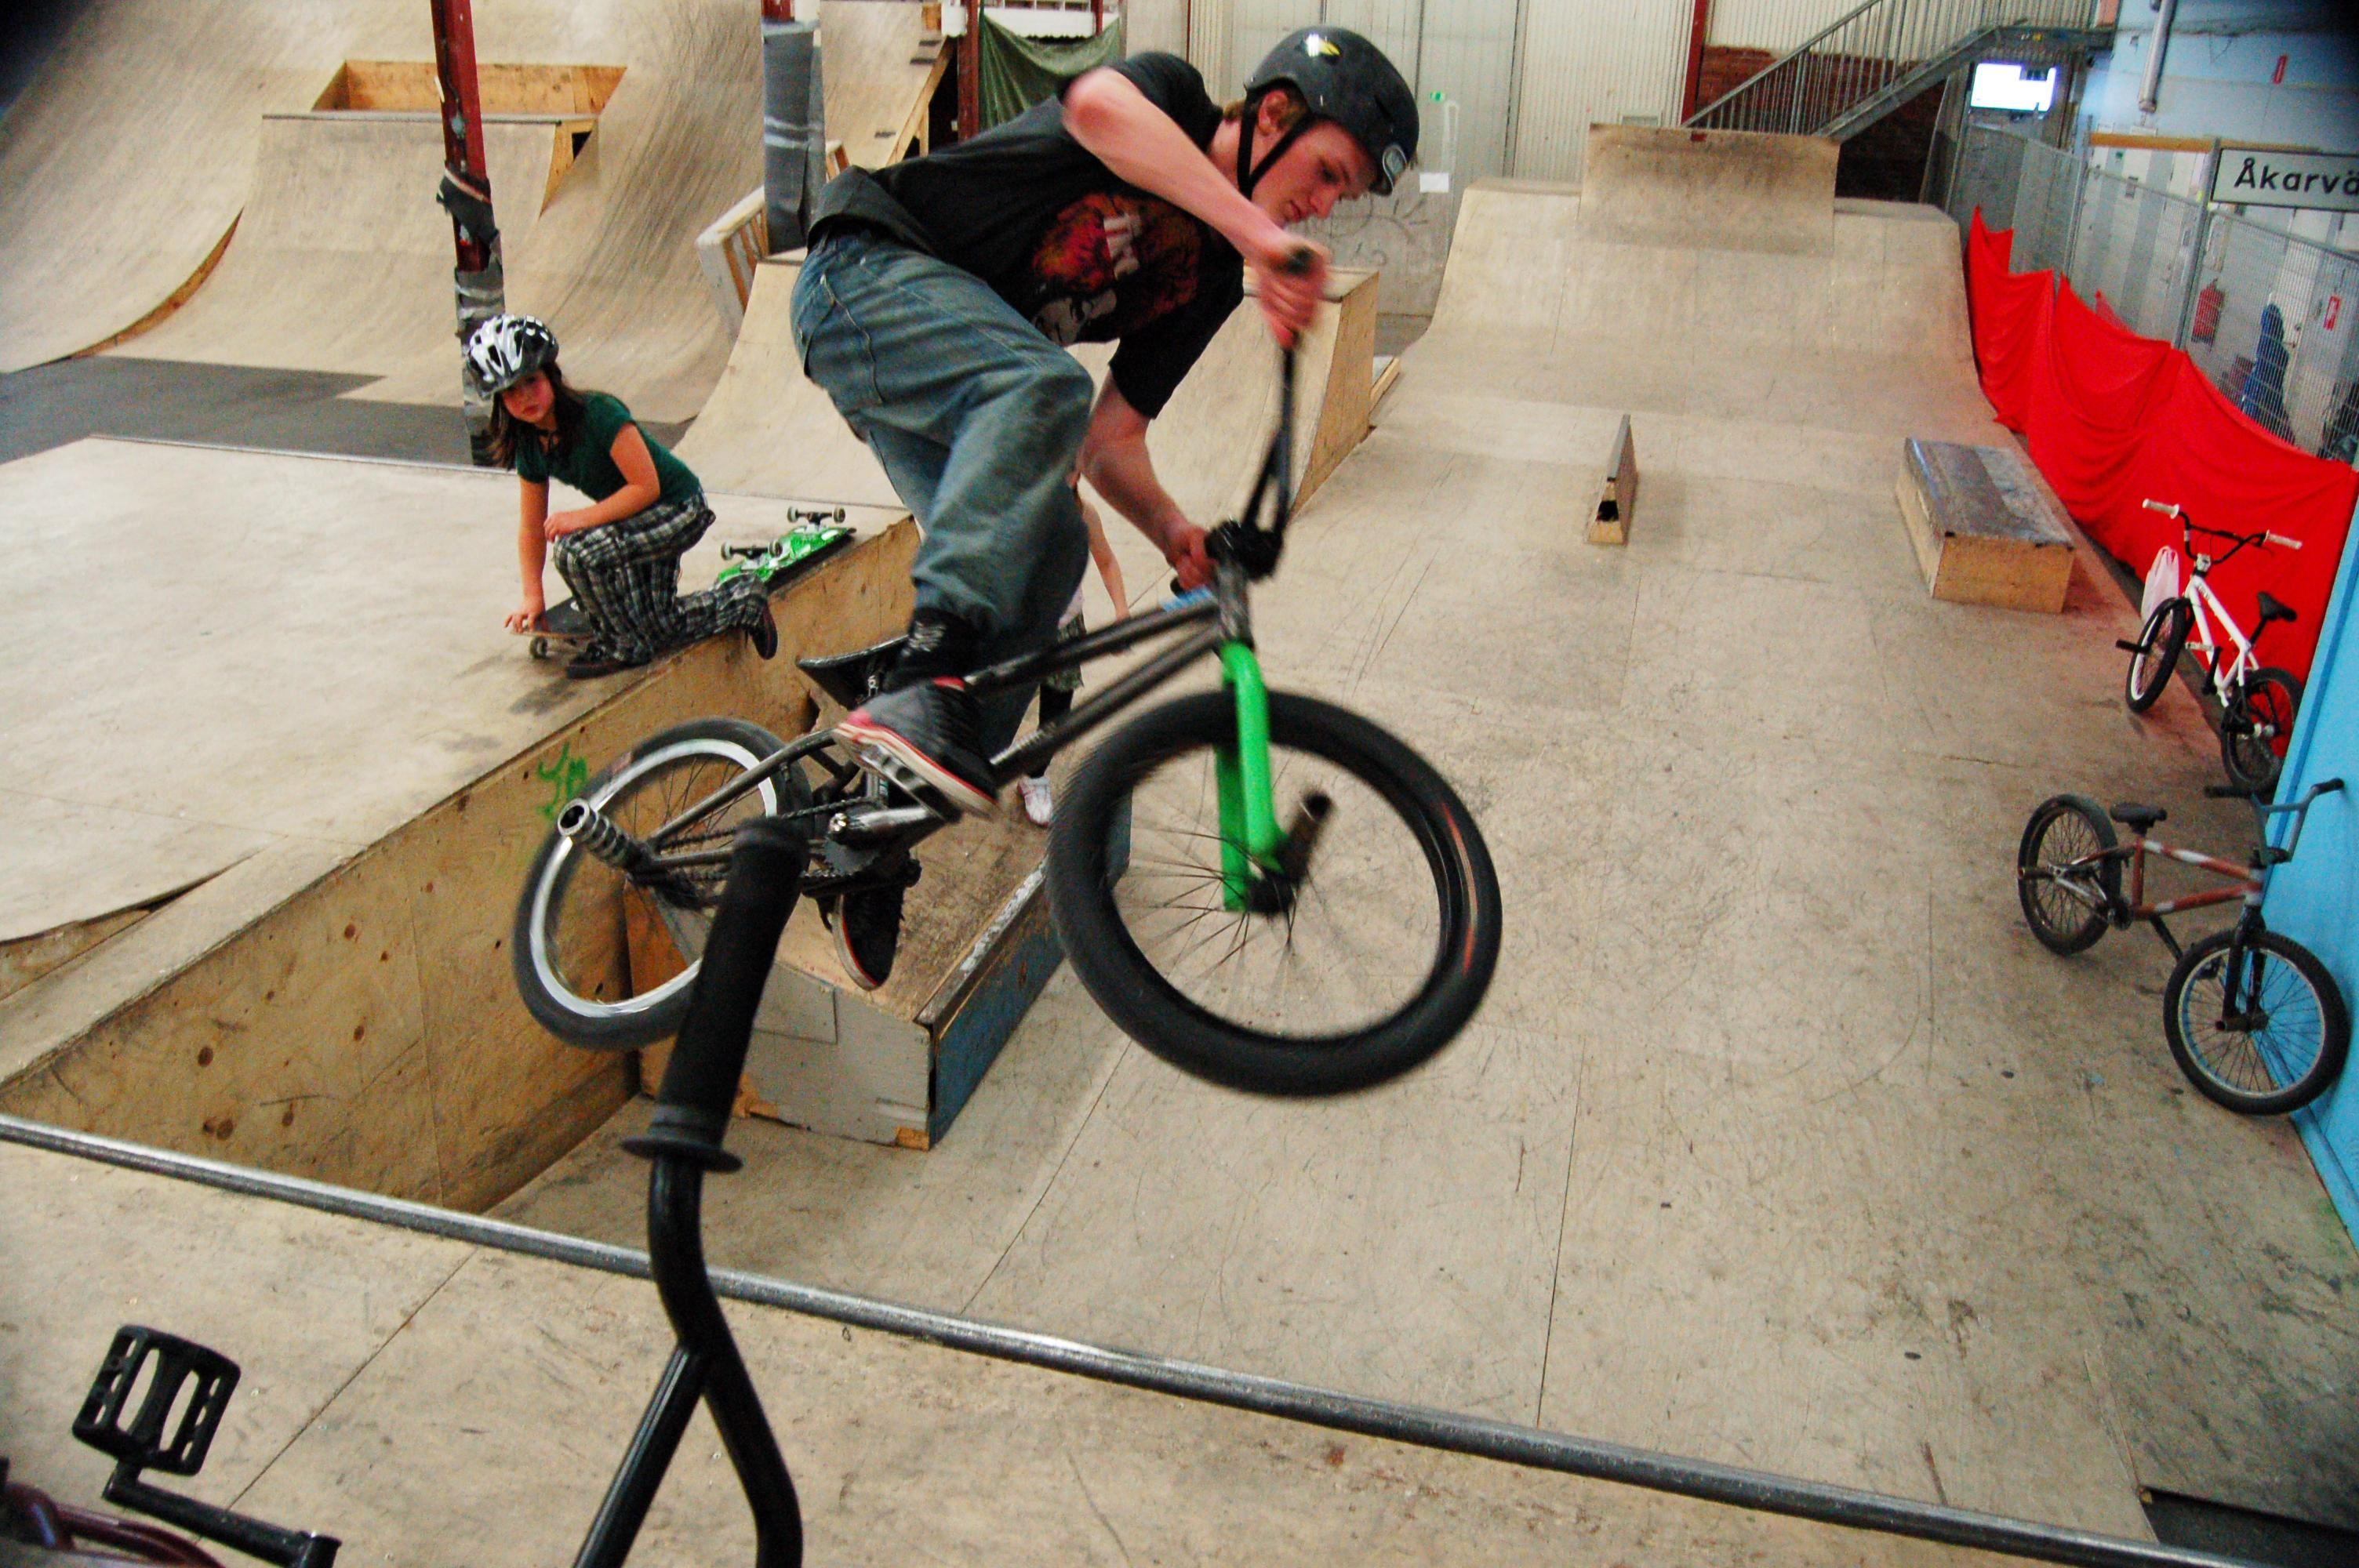 Drakstaden Skatepark